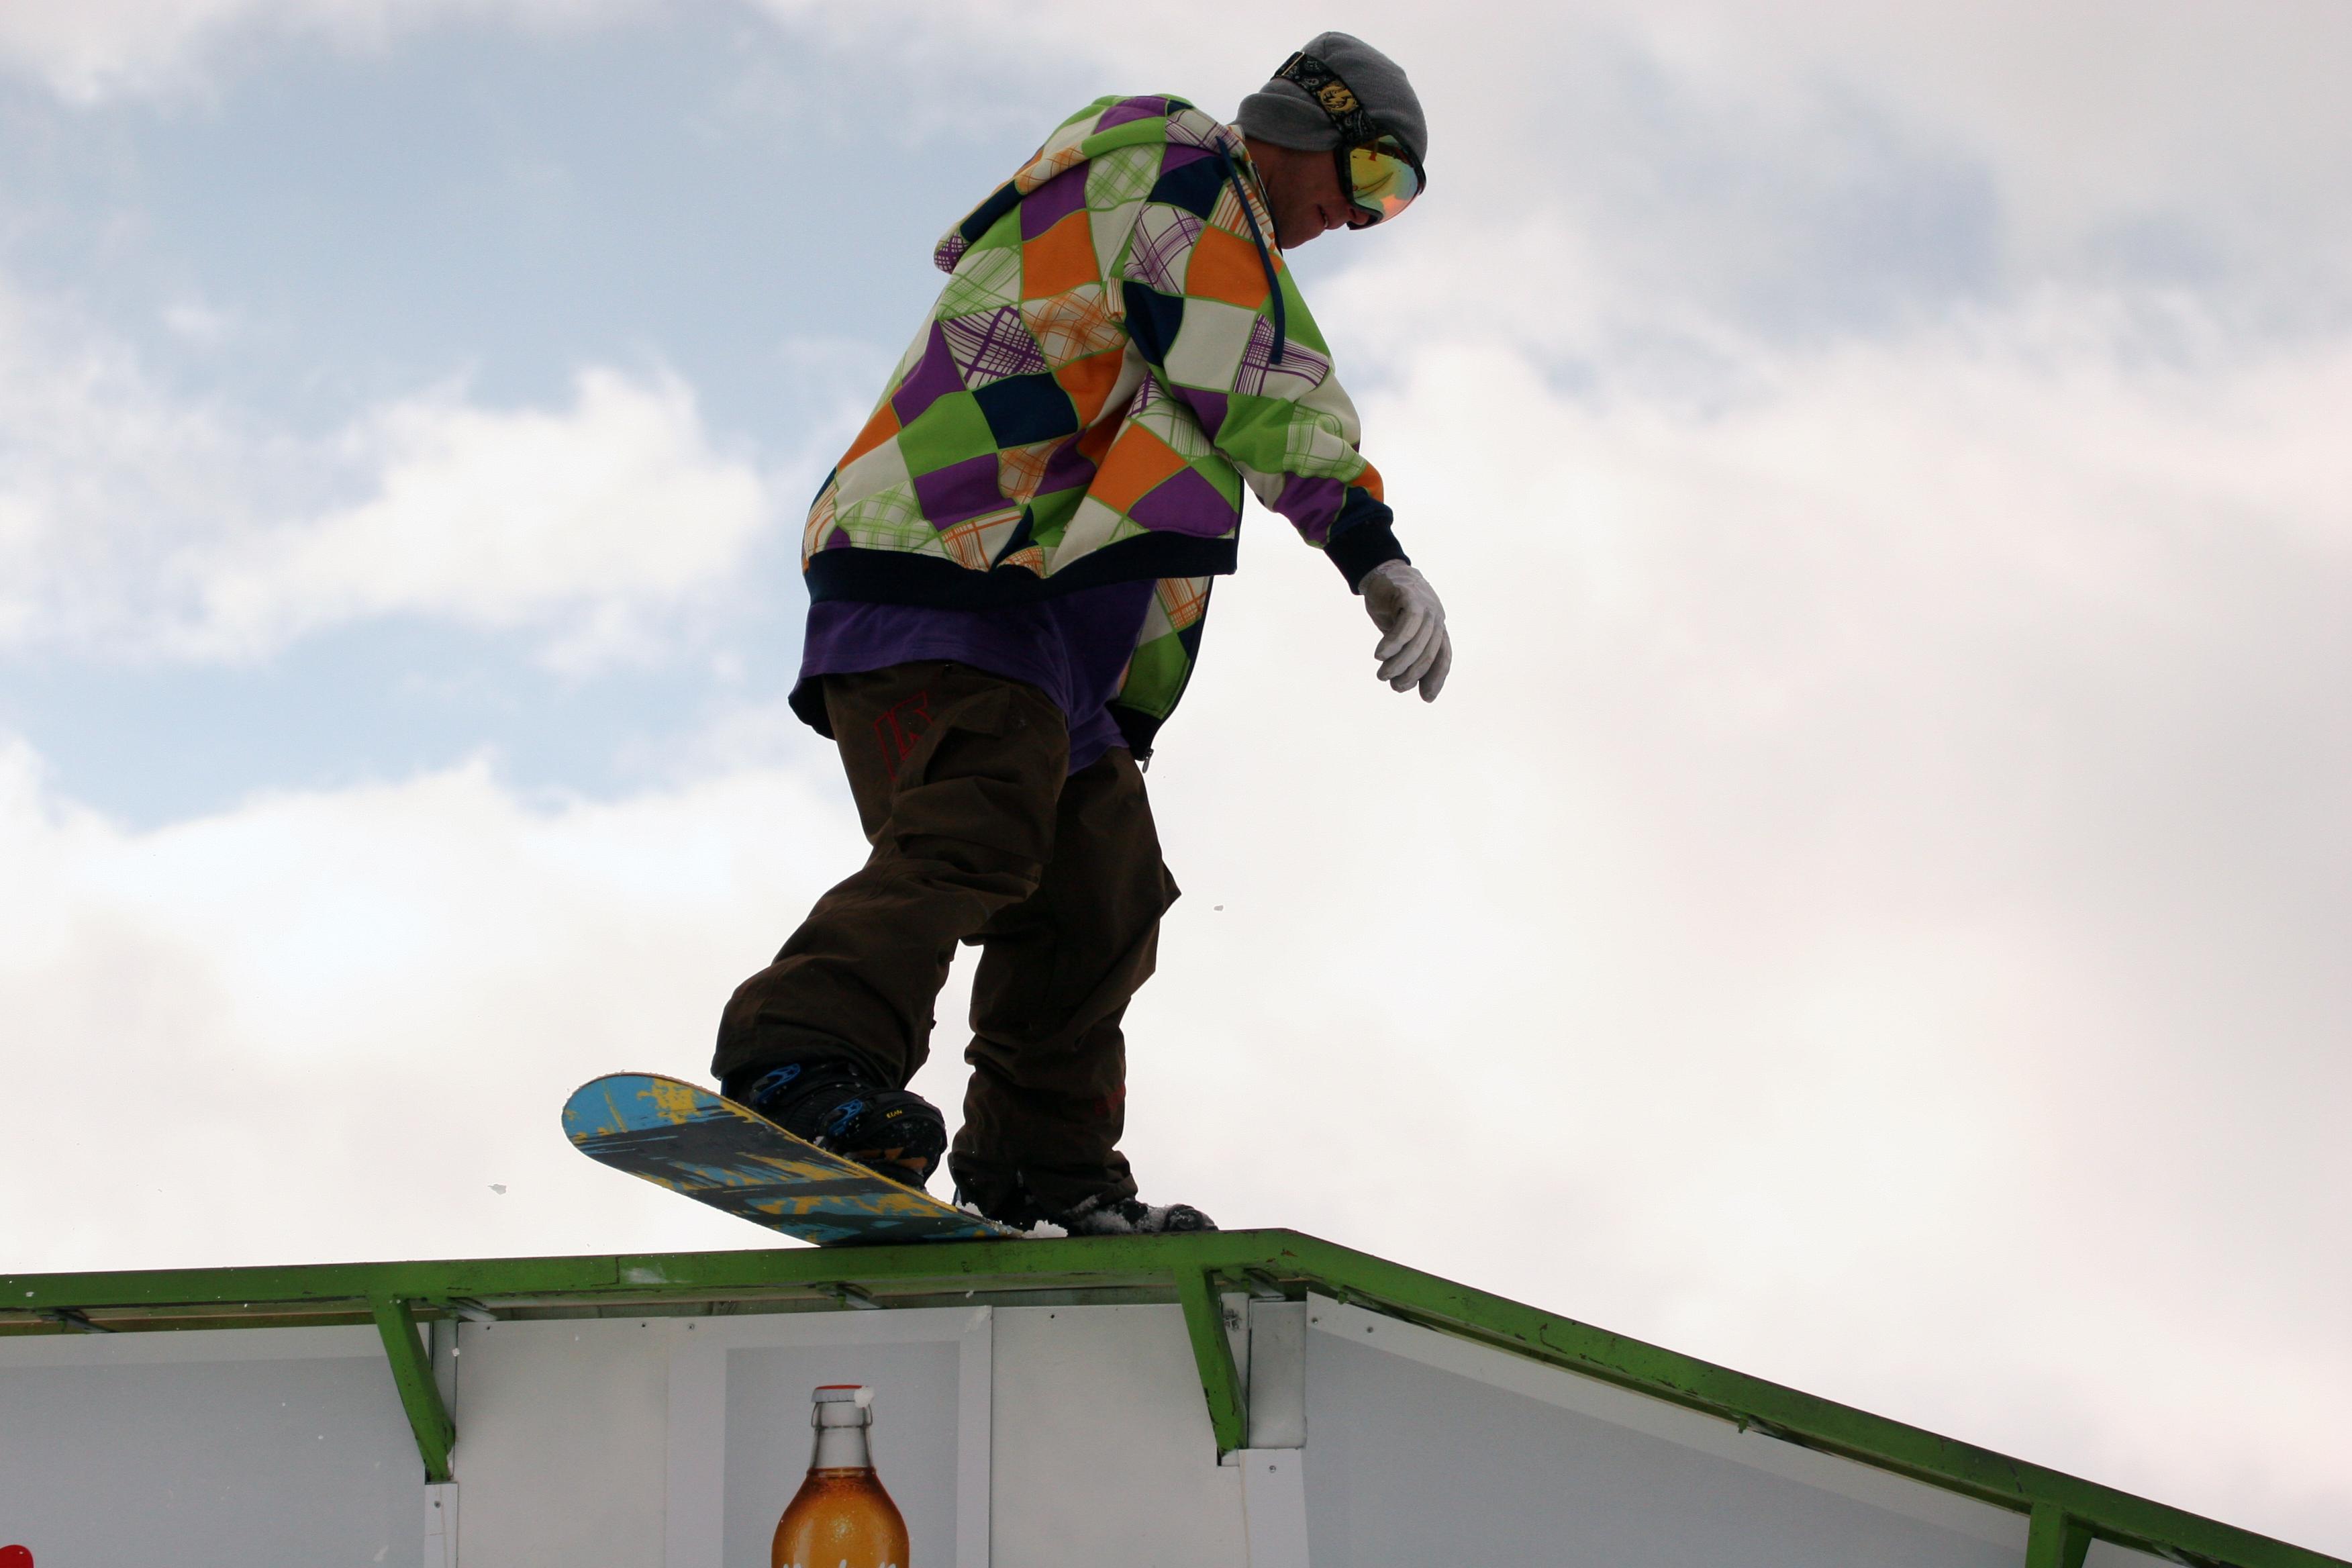 Snowboard bs kink #2